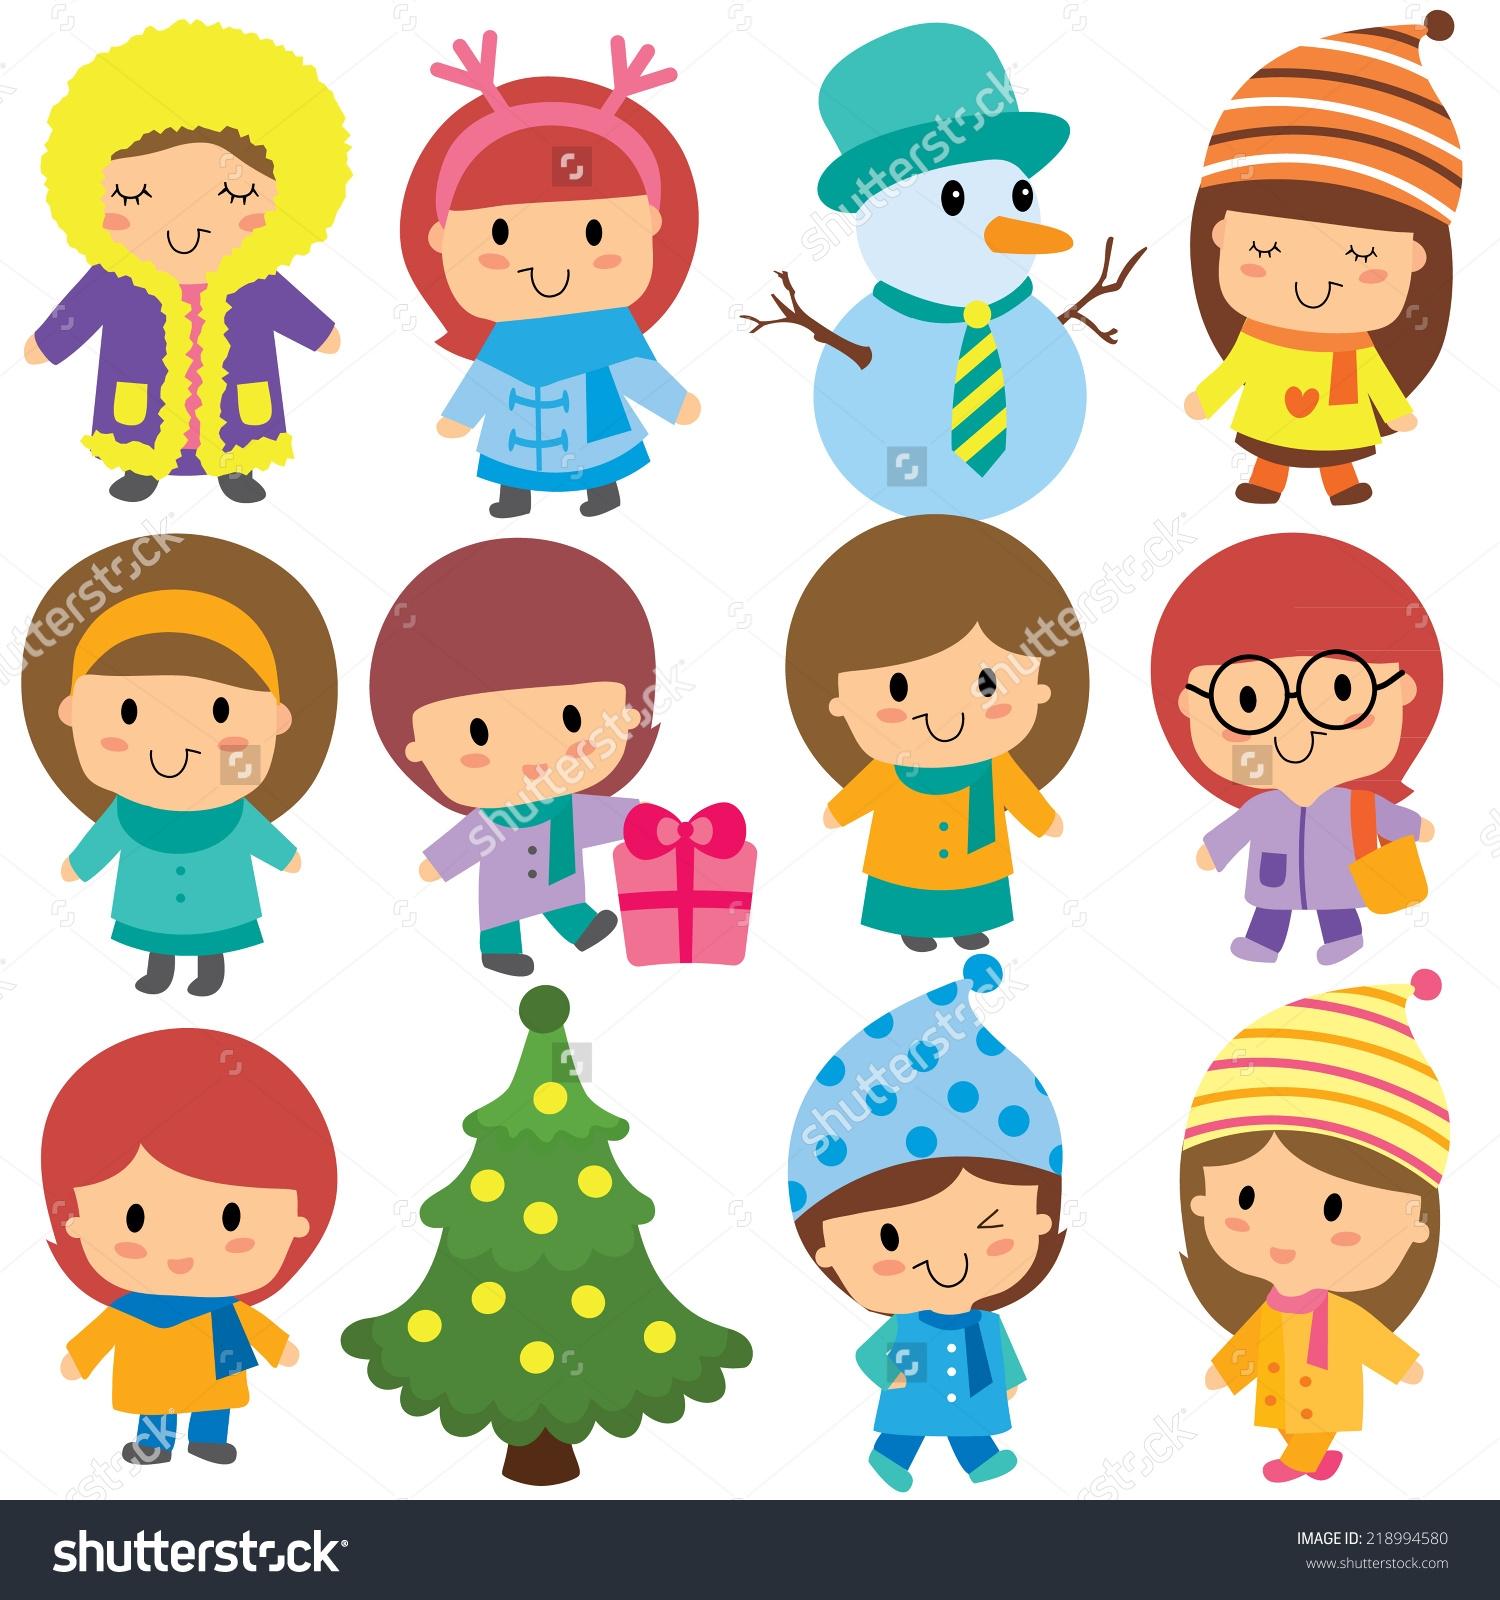 Cute Kid Clip Art - Google .-cute kid clip art - Google .-5